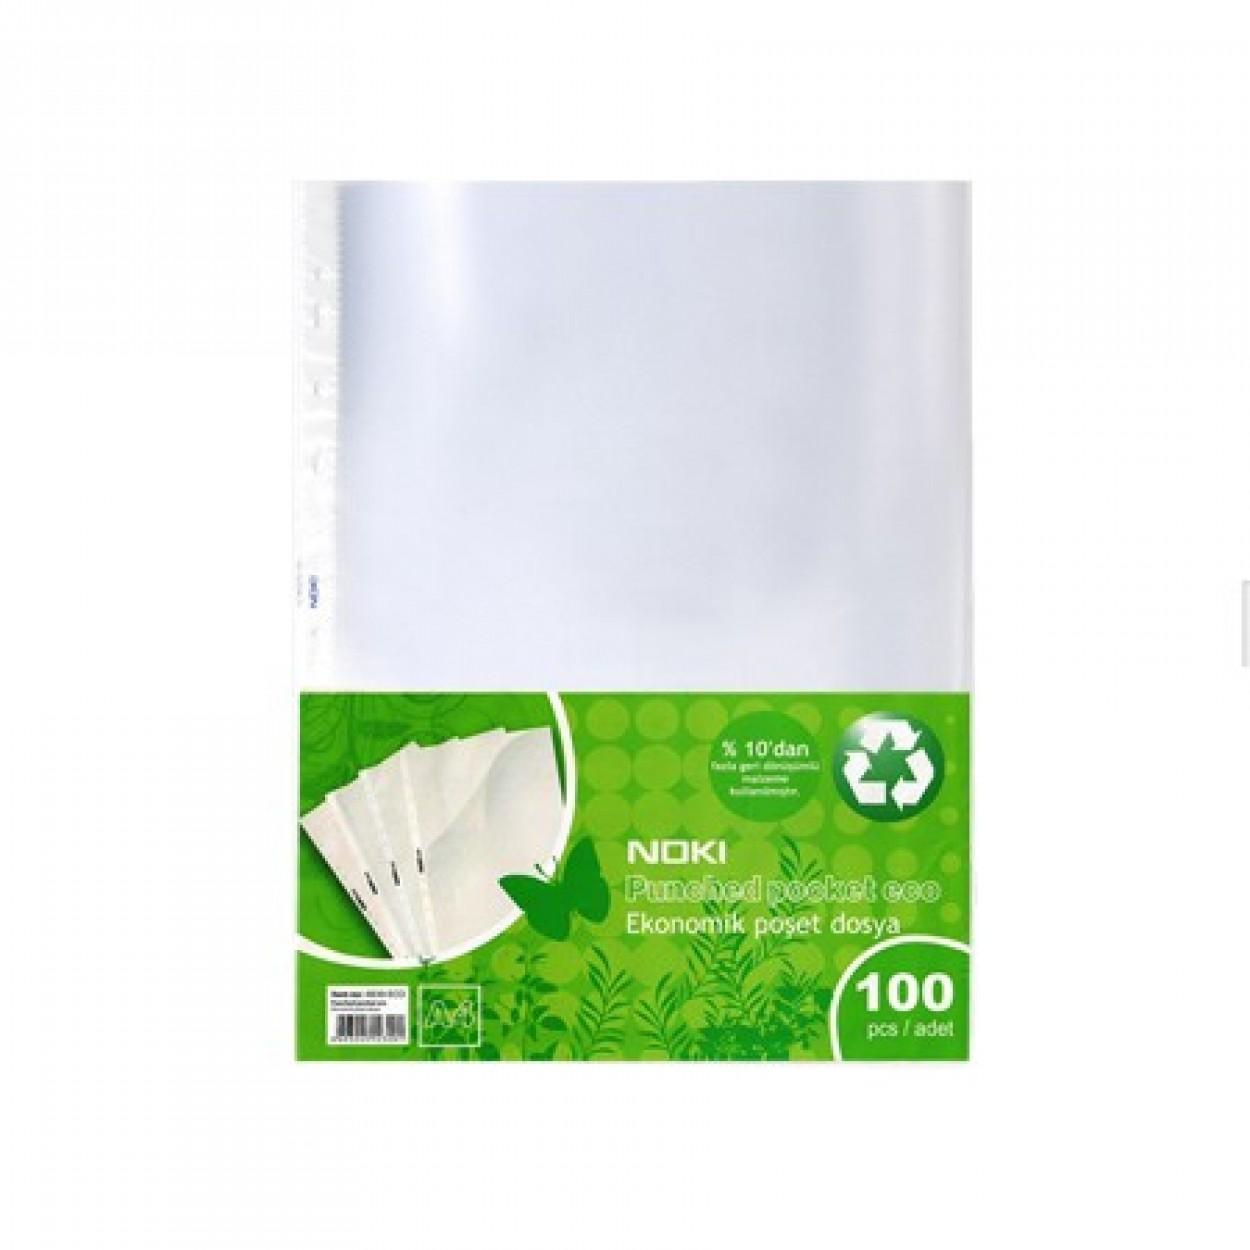 Noki Poşet Dosya Eco 100'Lü 5 Li Paket